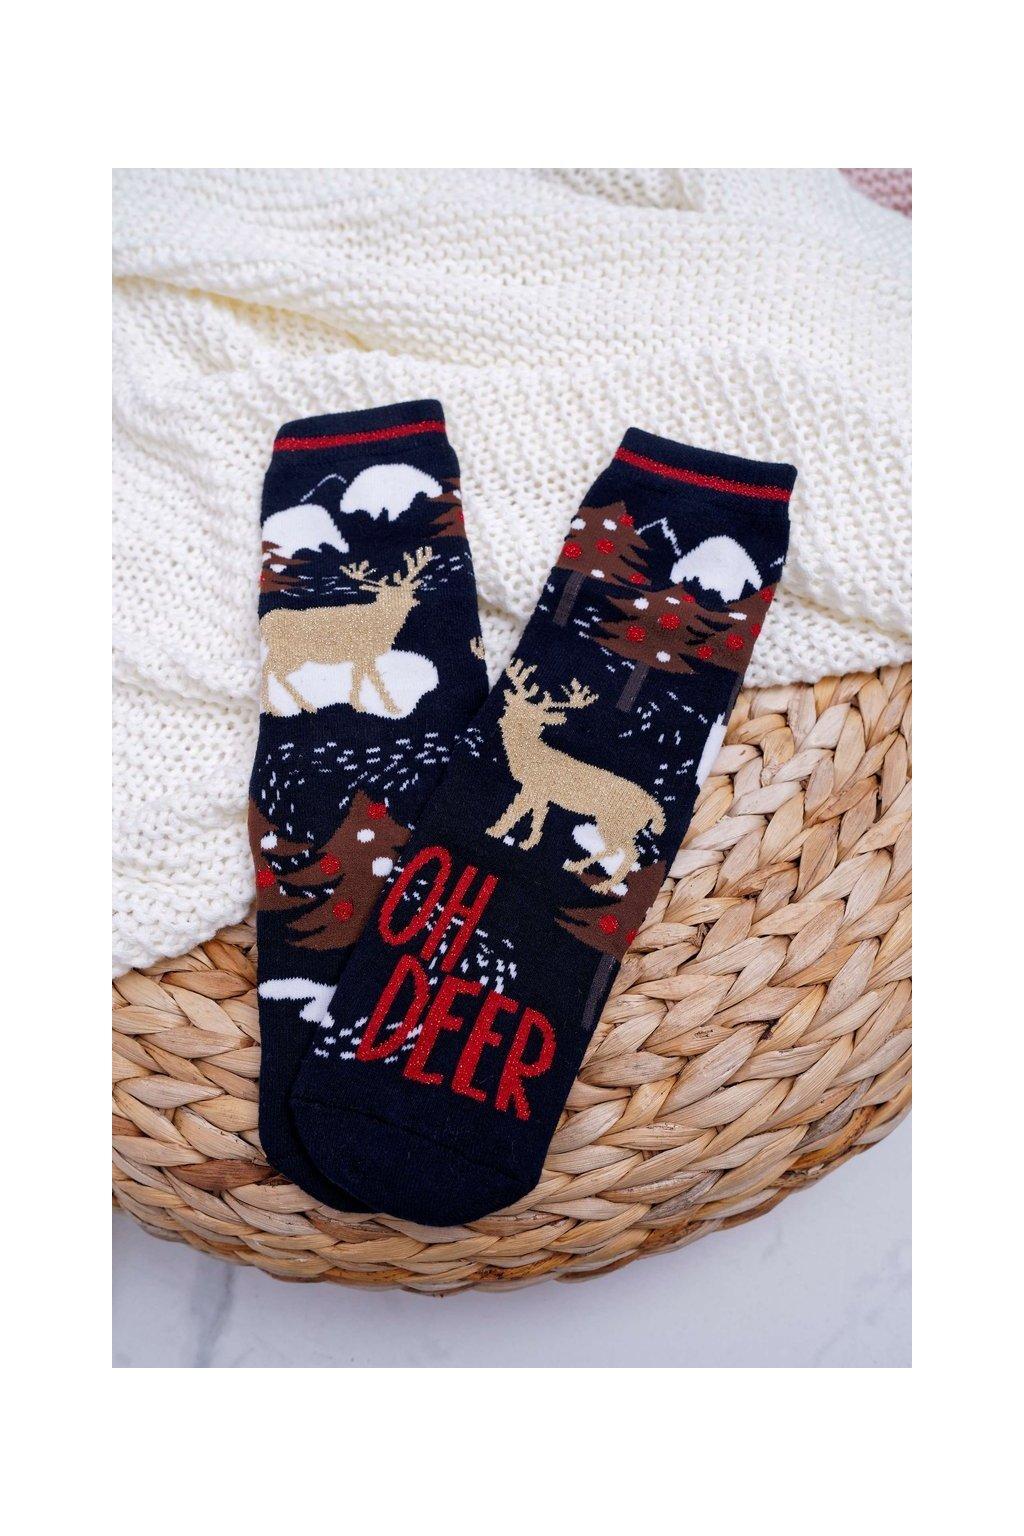 Dámske Ponožky vianočné protiskluzové tmavo modré OH DEER